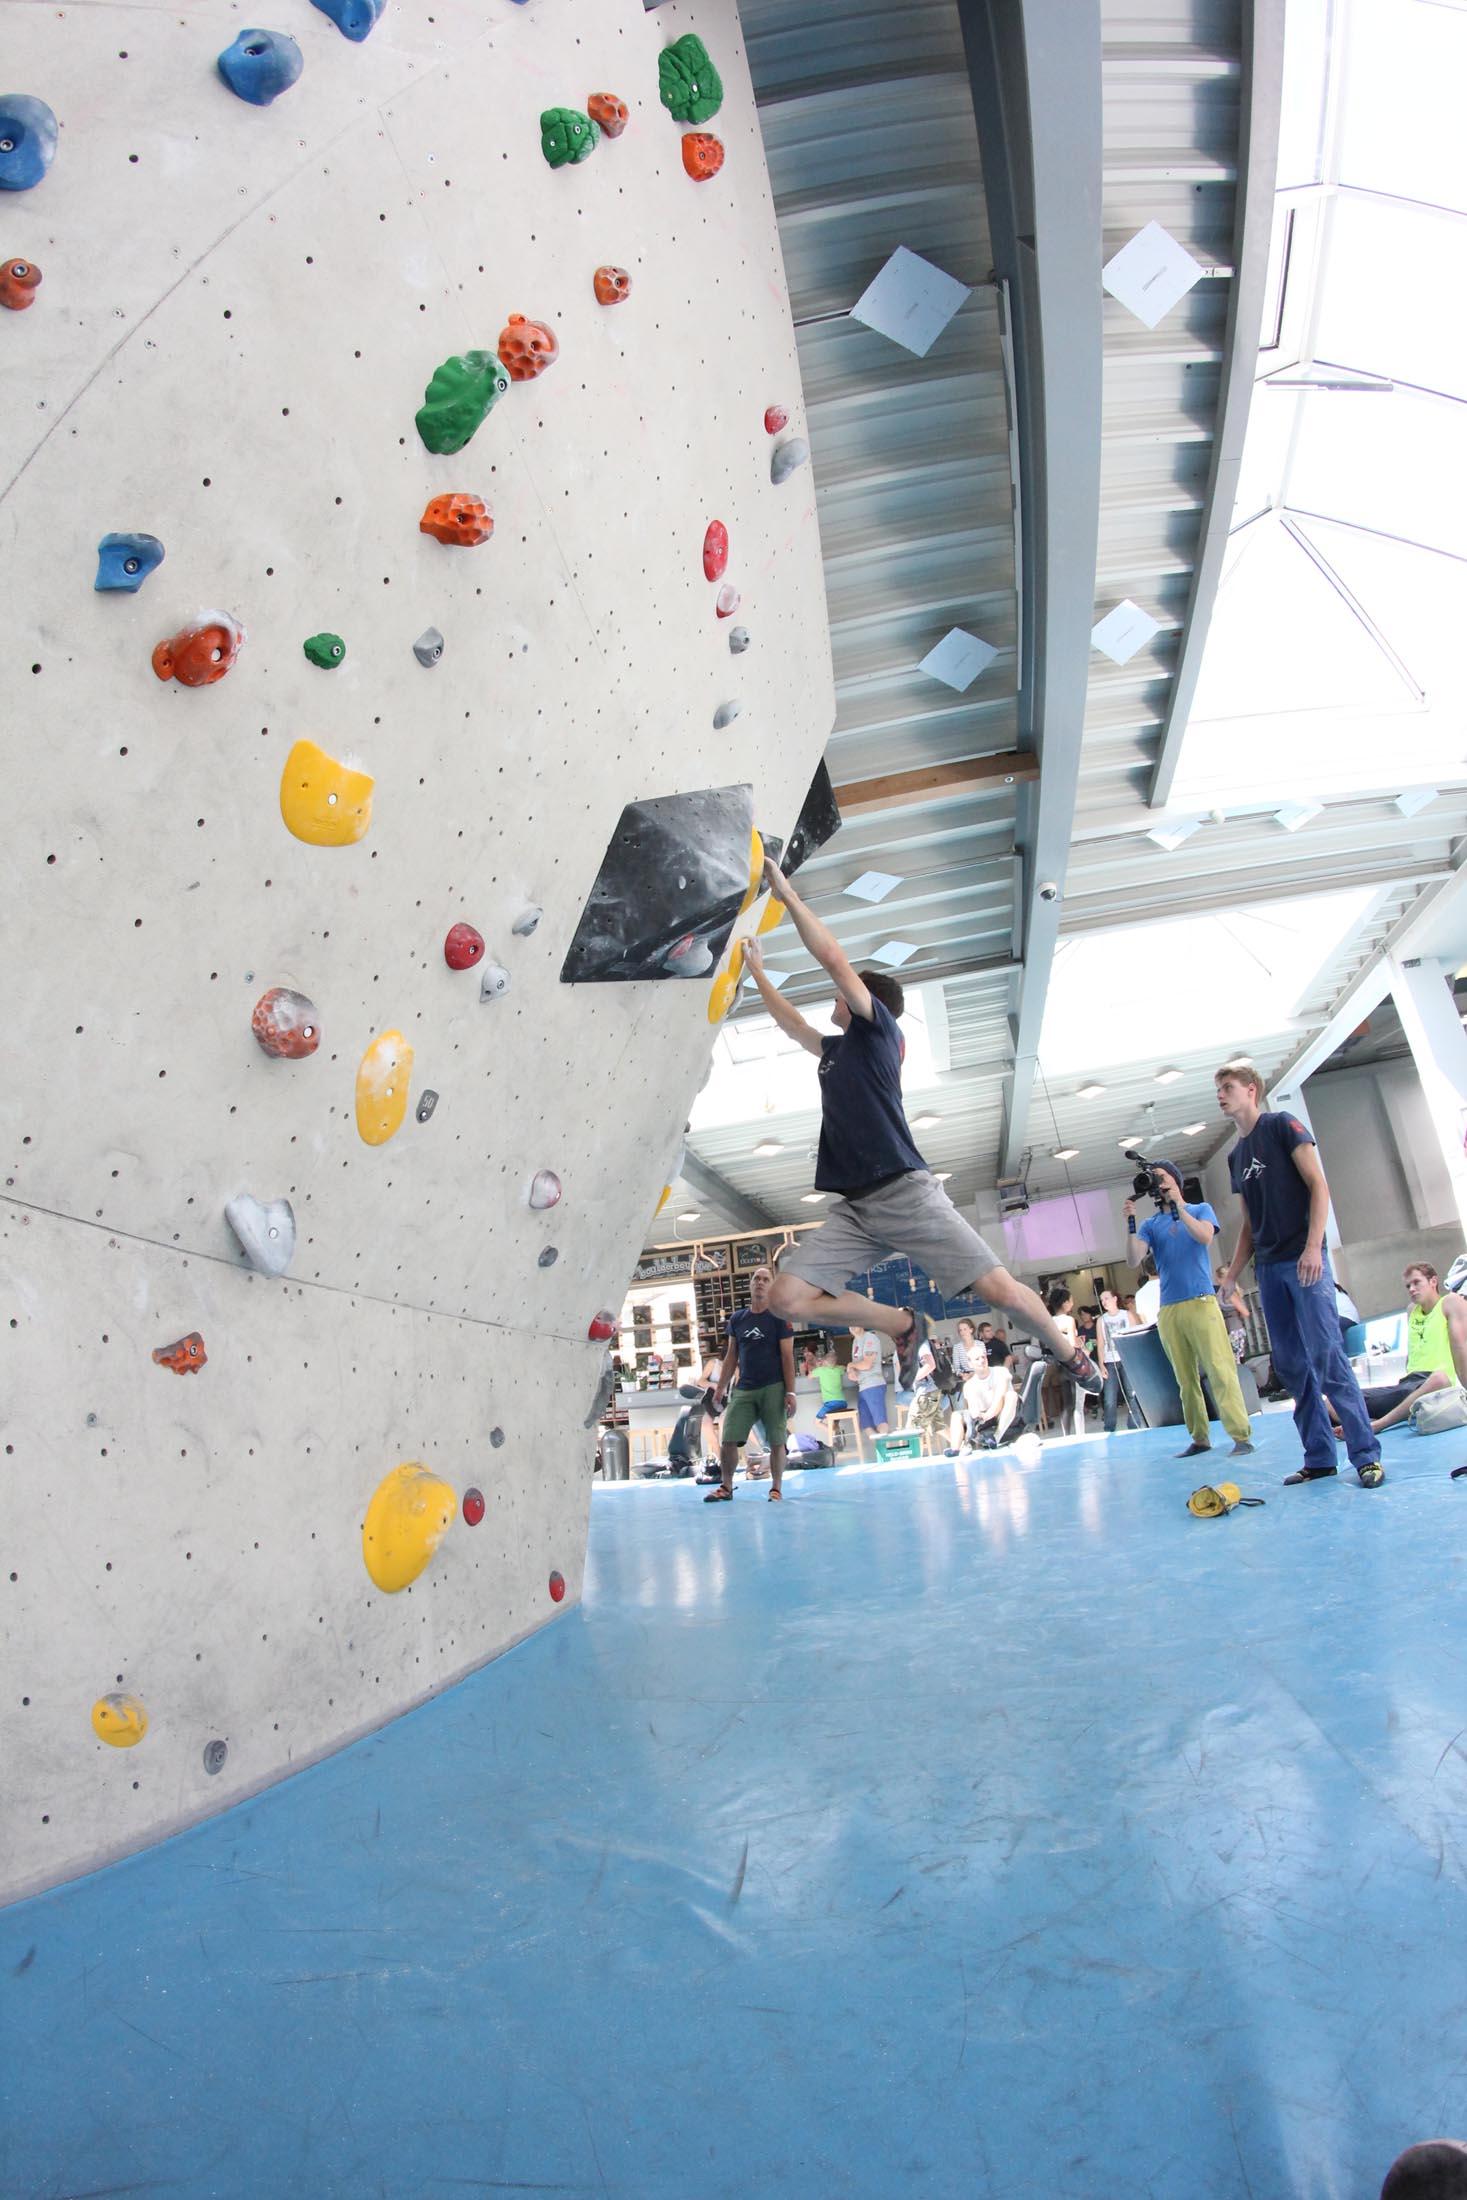 Quali, internationaler bouldercup Frankenjura 2016, BLOCKHELDEN Erlangen, Mammut, Bergfreunde.de, Boulderwettkampf07092016127